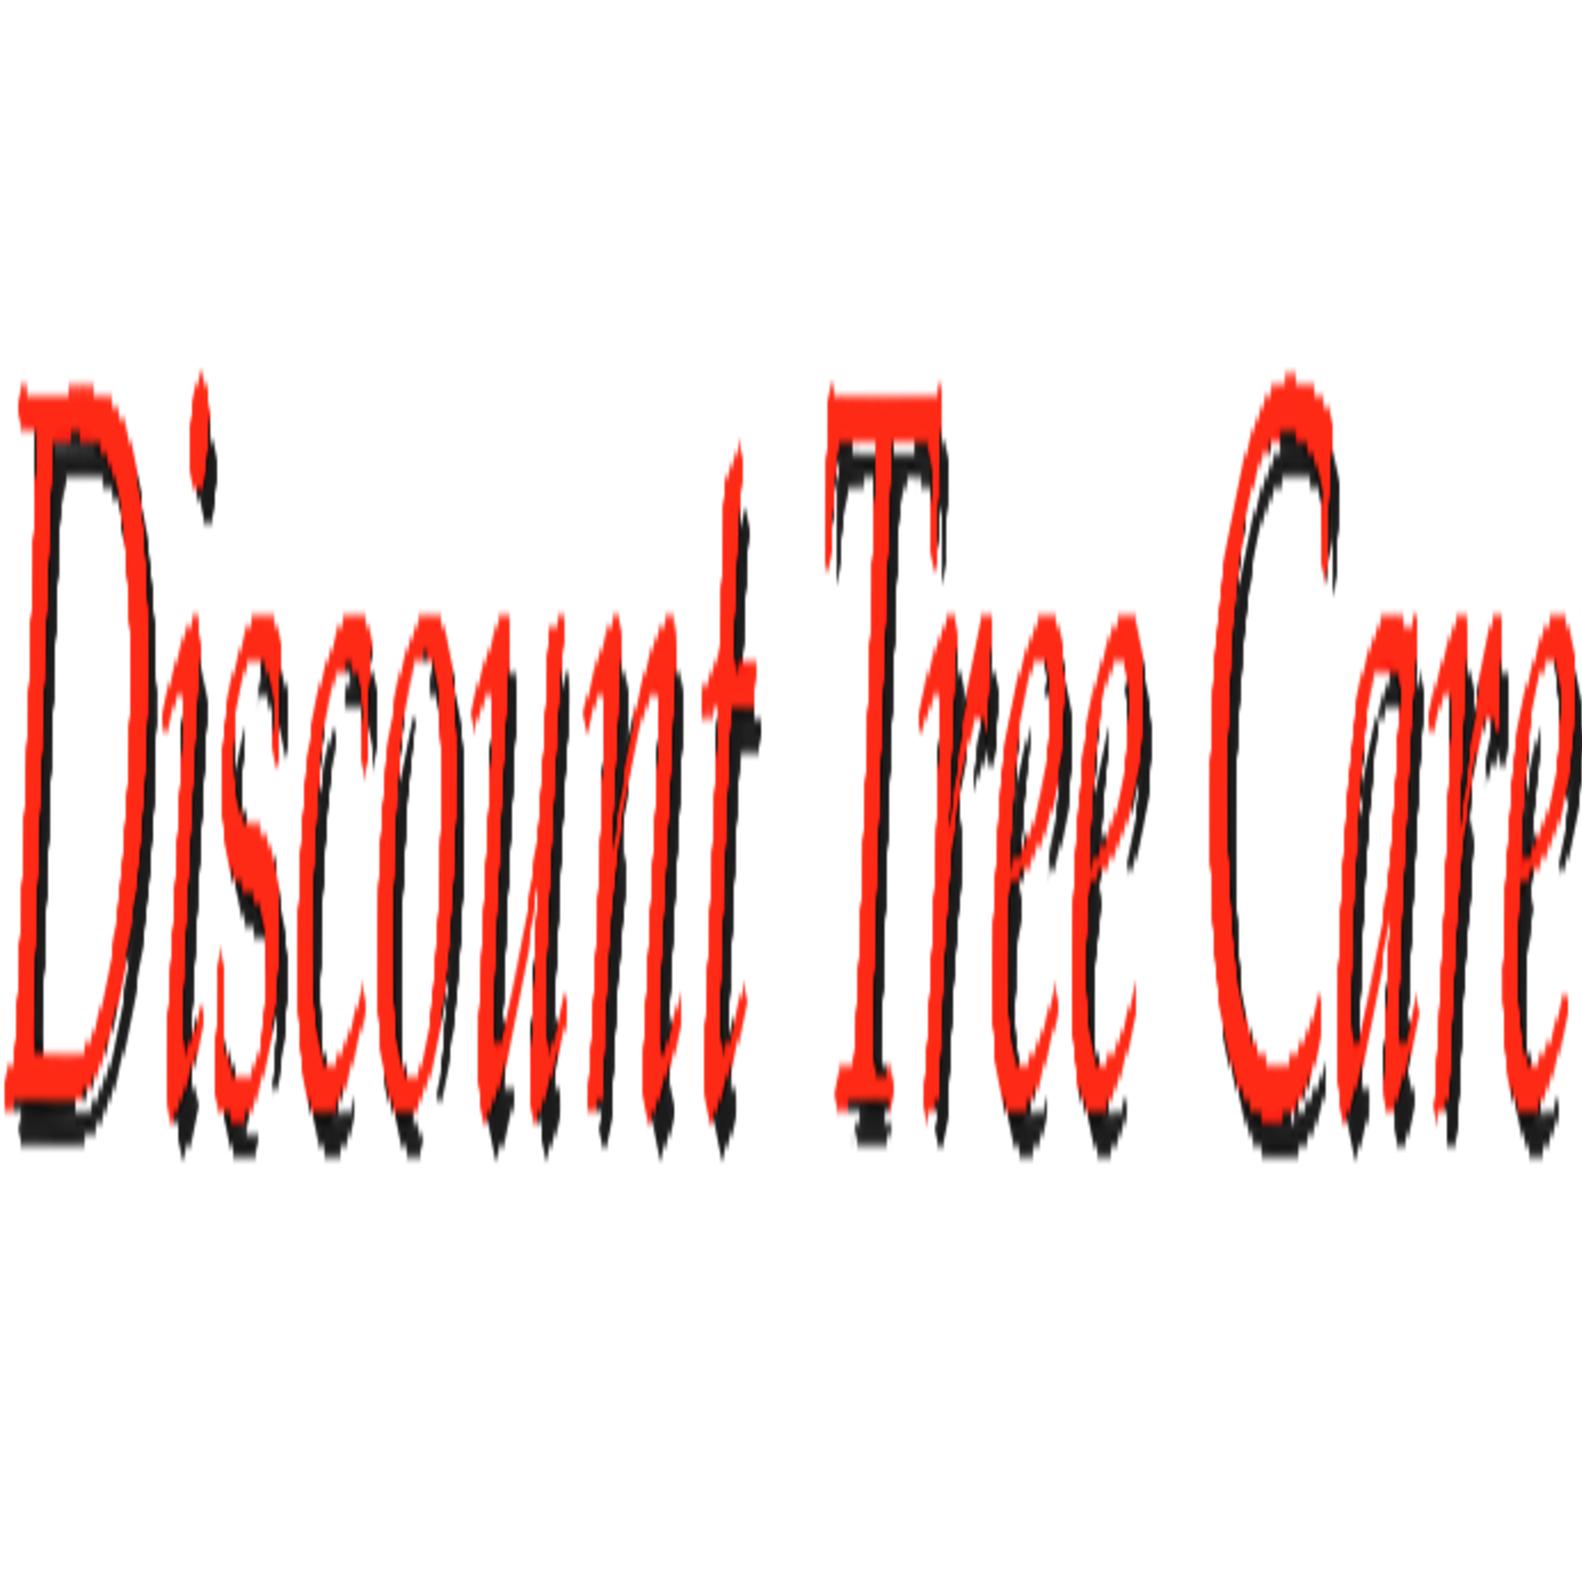 Discount Tree Care, Inc